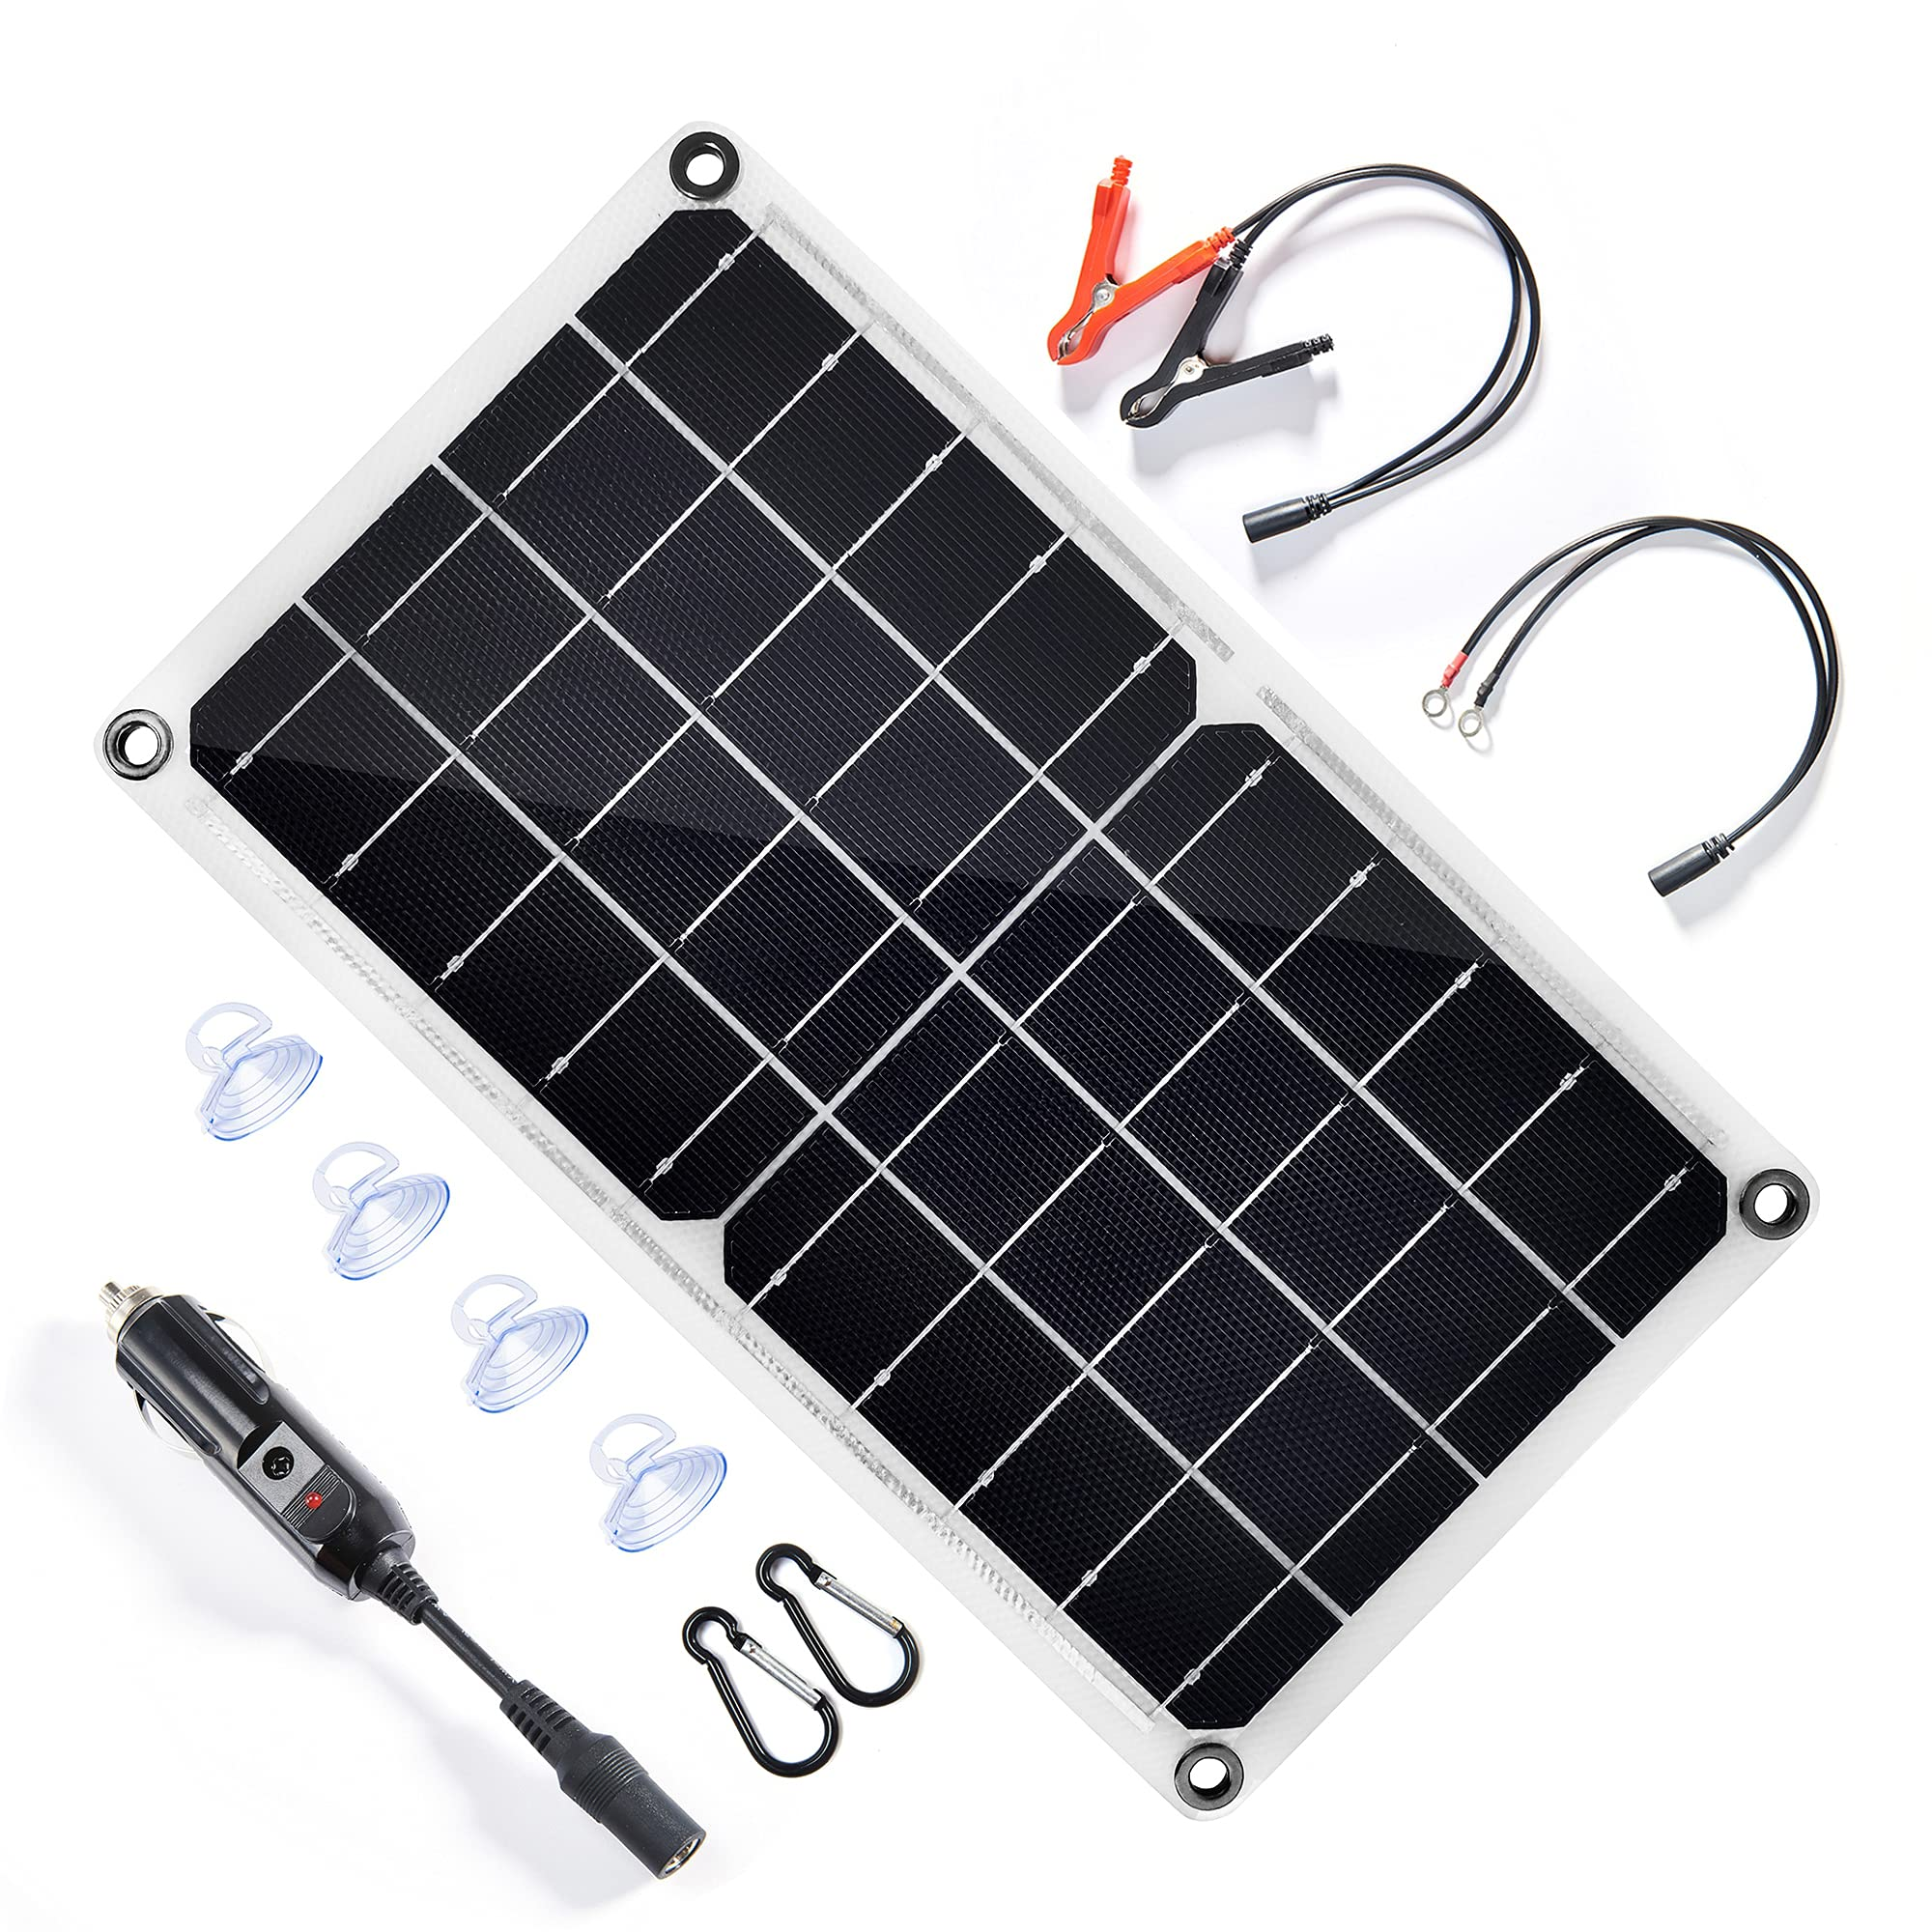 TP-solar10 Watt 12 Volt Solar Panel Battery Charger 10W 12V Portable Solar Trickle Battery Maintainer with Cigarette Lighter Plug & Alligator Clip for Car Boat